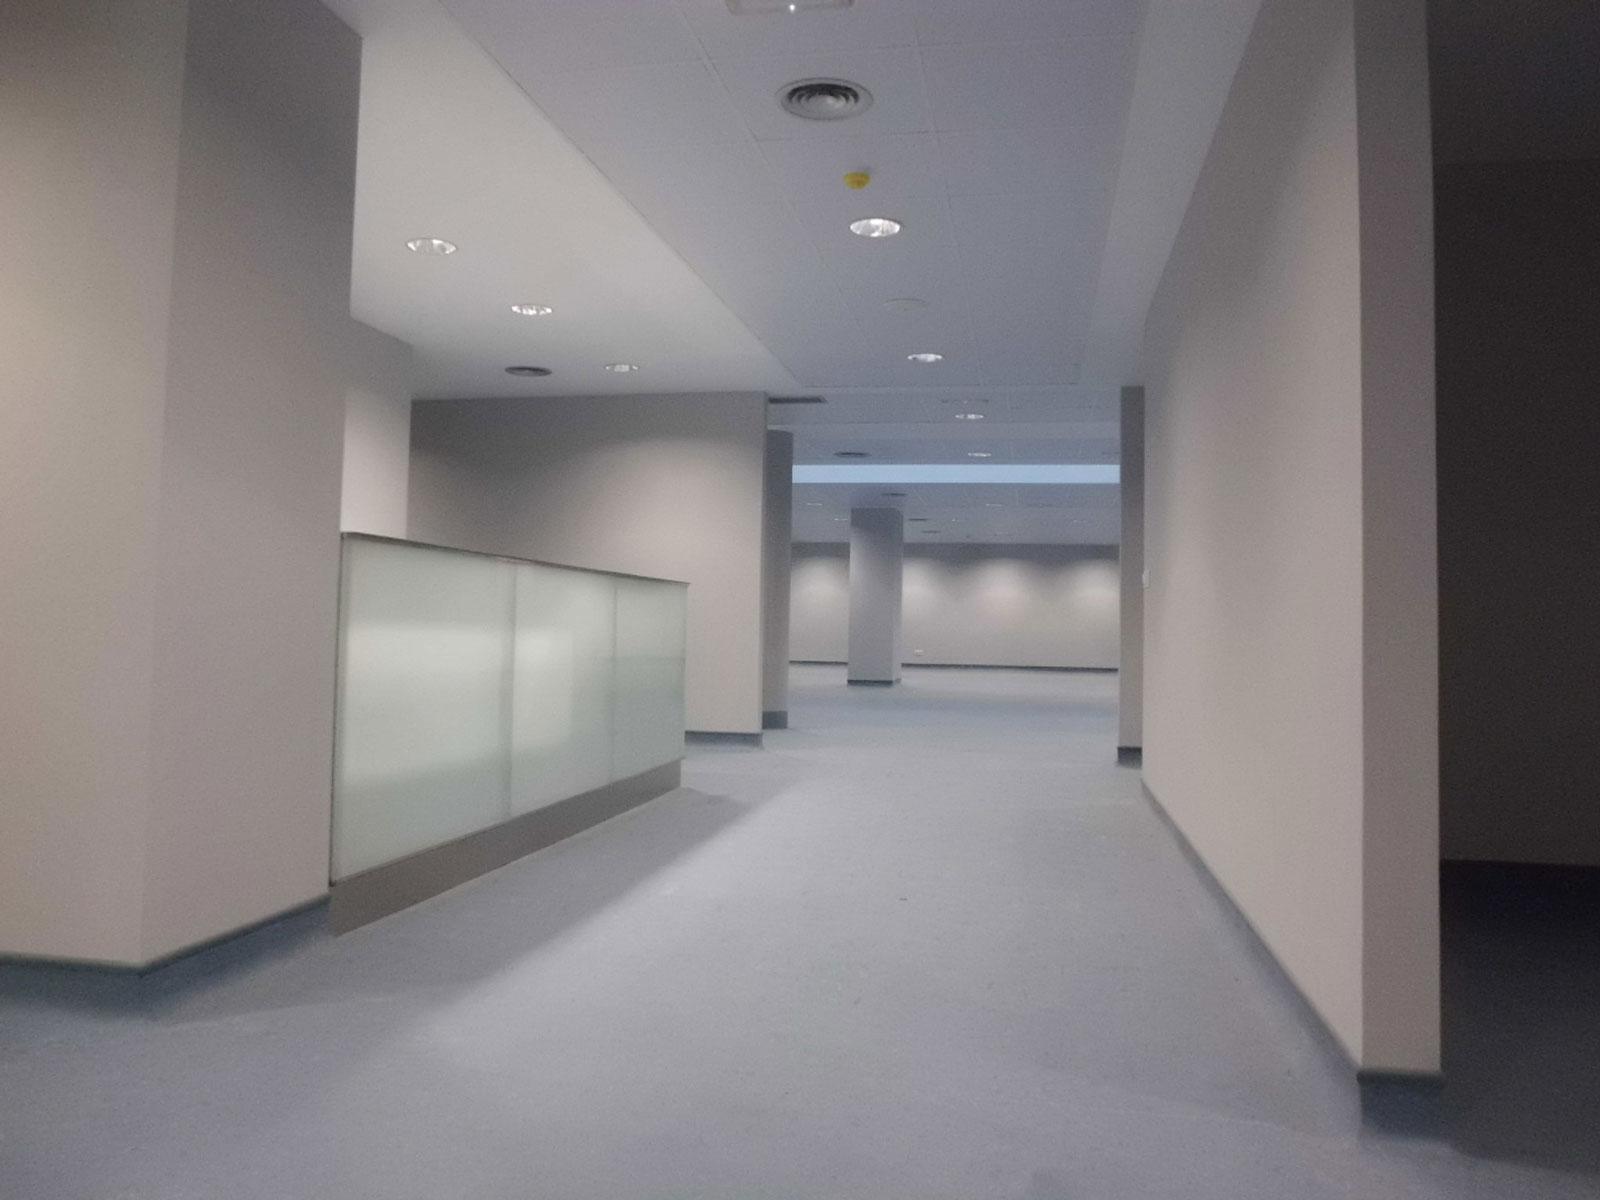 Rehabilitaci n sociosanitari francol t80 arquitectura for Arquitectura tecnica ua